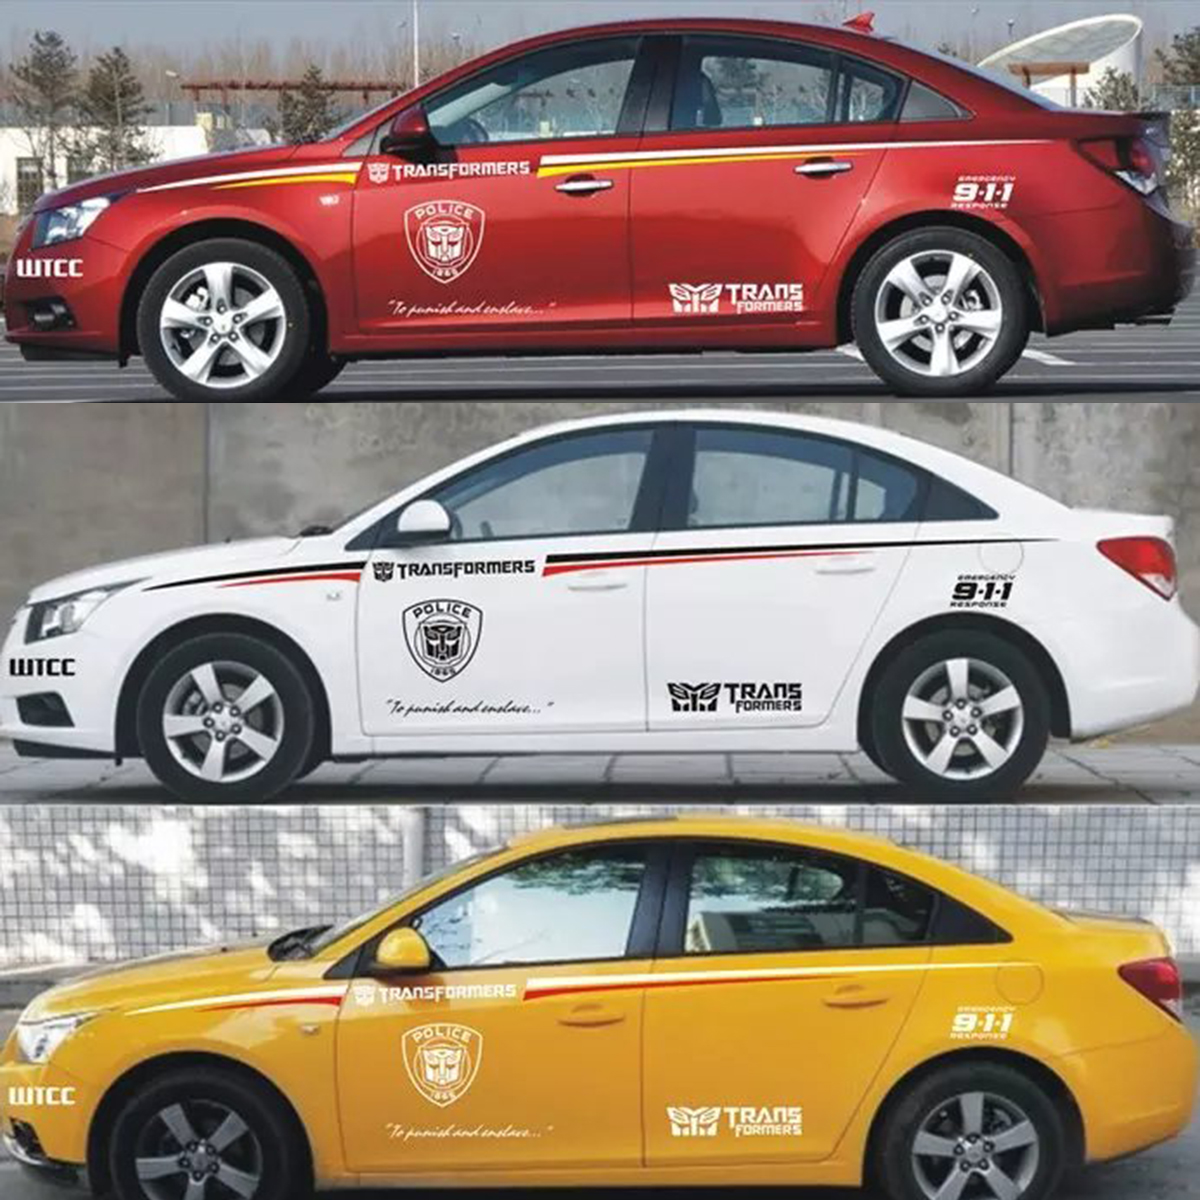 Car stickers design philippines - Car Modification Waist Body Paste Modified Us Version 911 Police Transformers Hornet Waist Body Garland Decorative